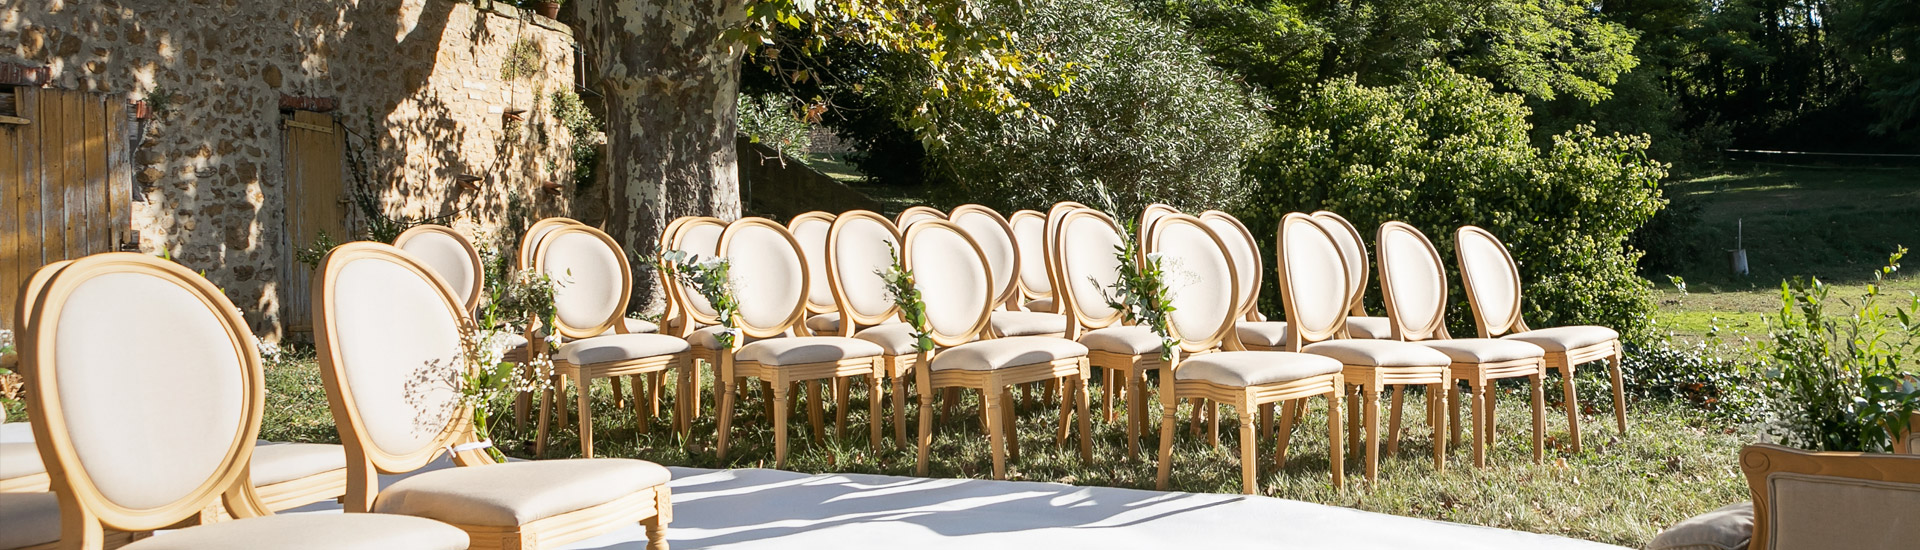 chaises médaillon